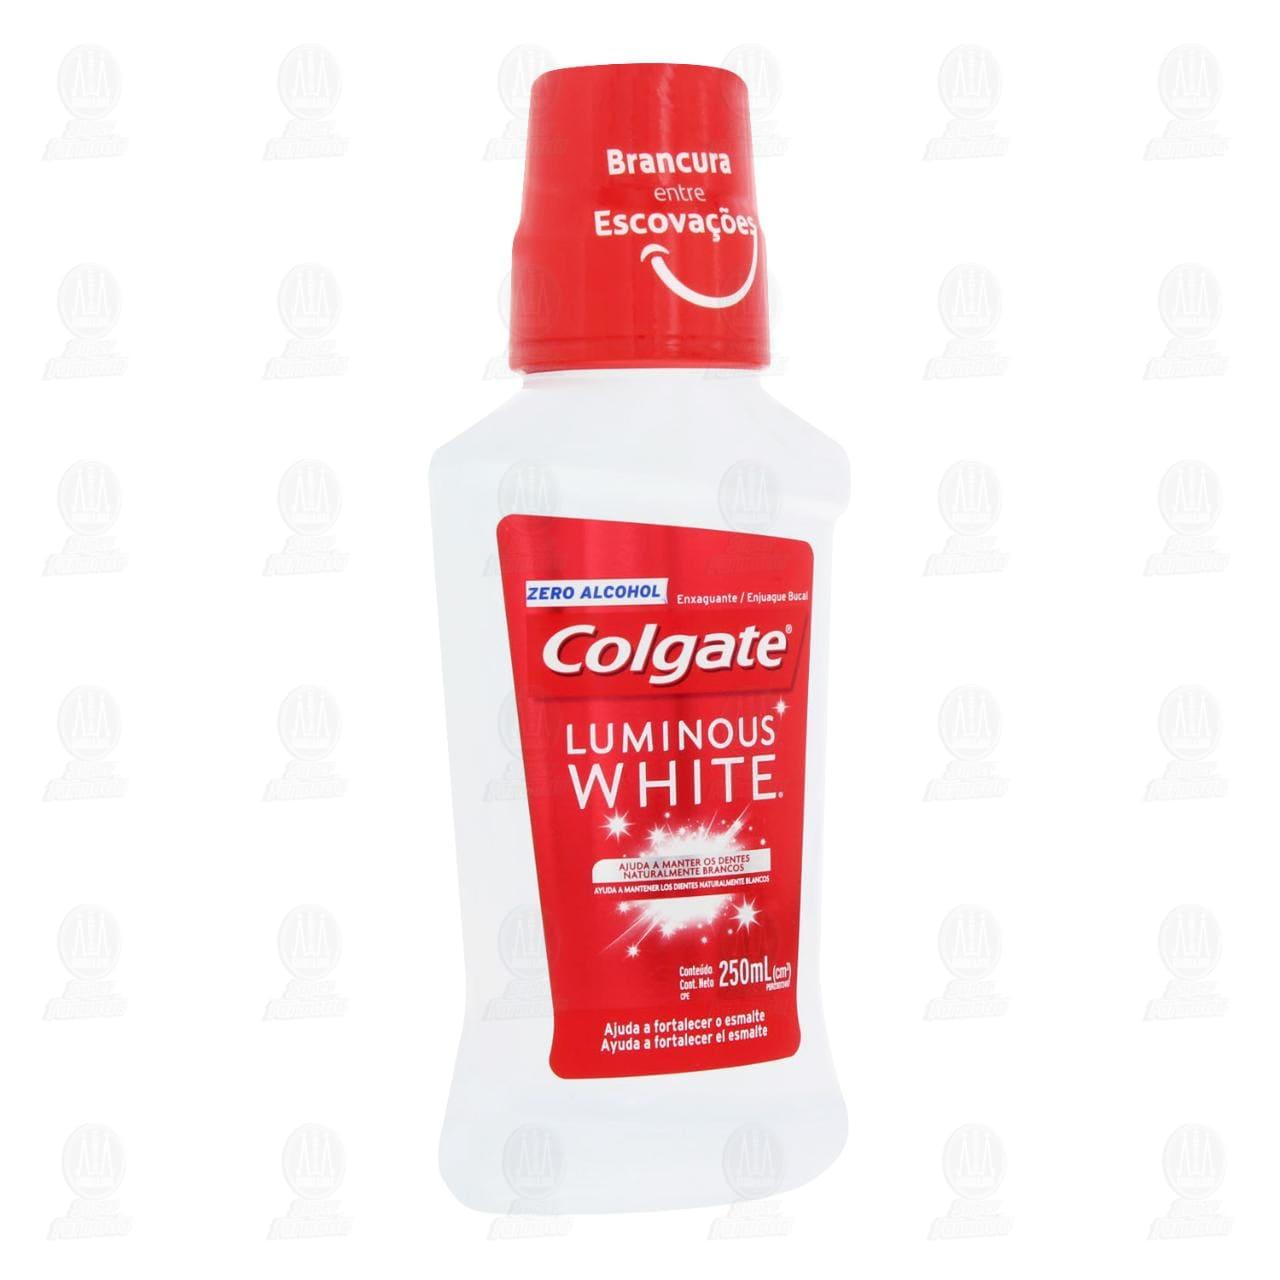 Comprar Enjuague Bucal Colgate Luminous White, 250 ml. en Farmacias Guadalajara